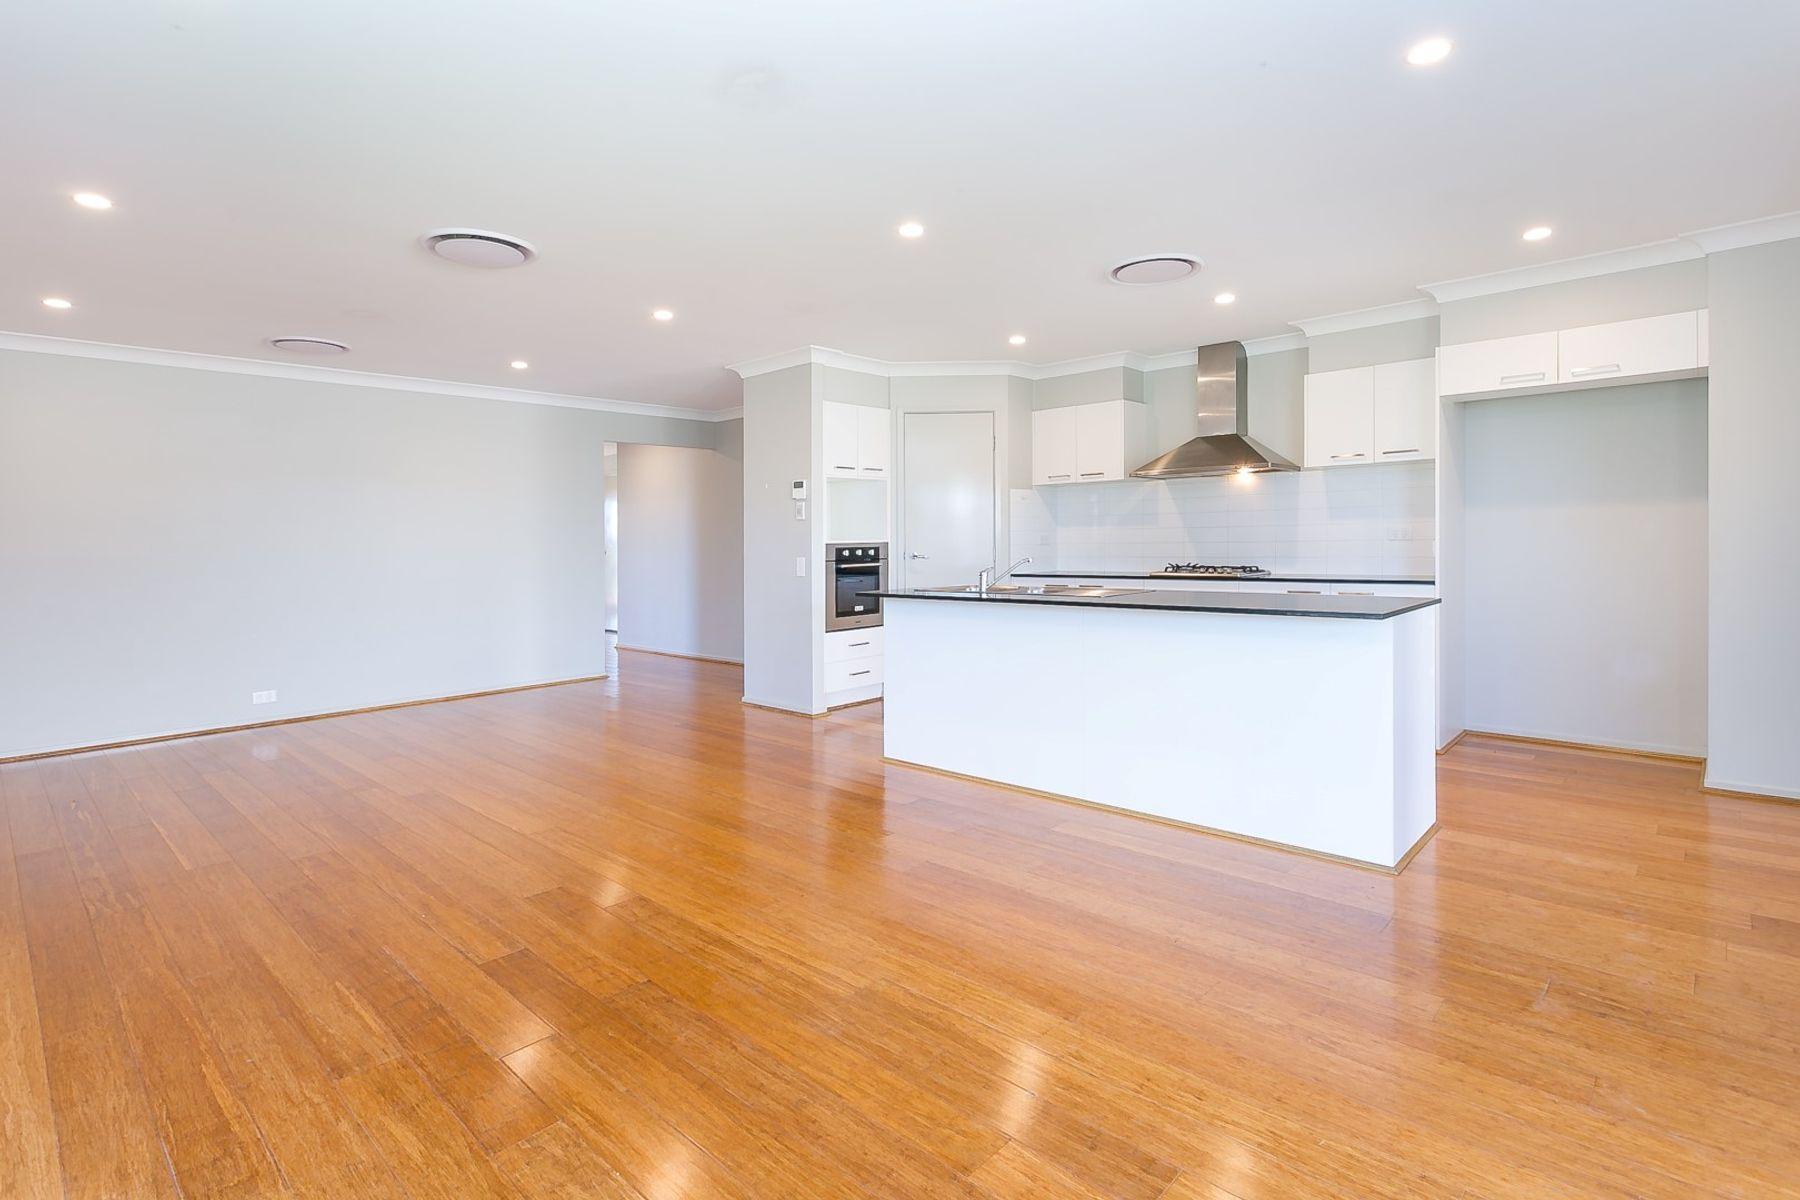 1 Pleasant Street, South Ripley, QLD 4306